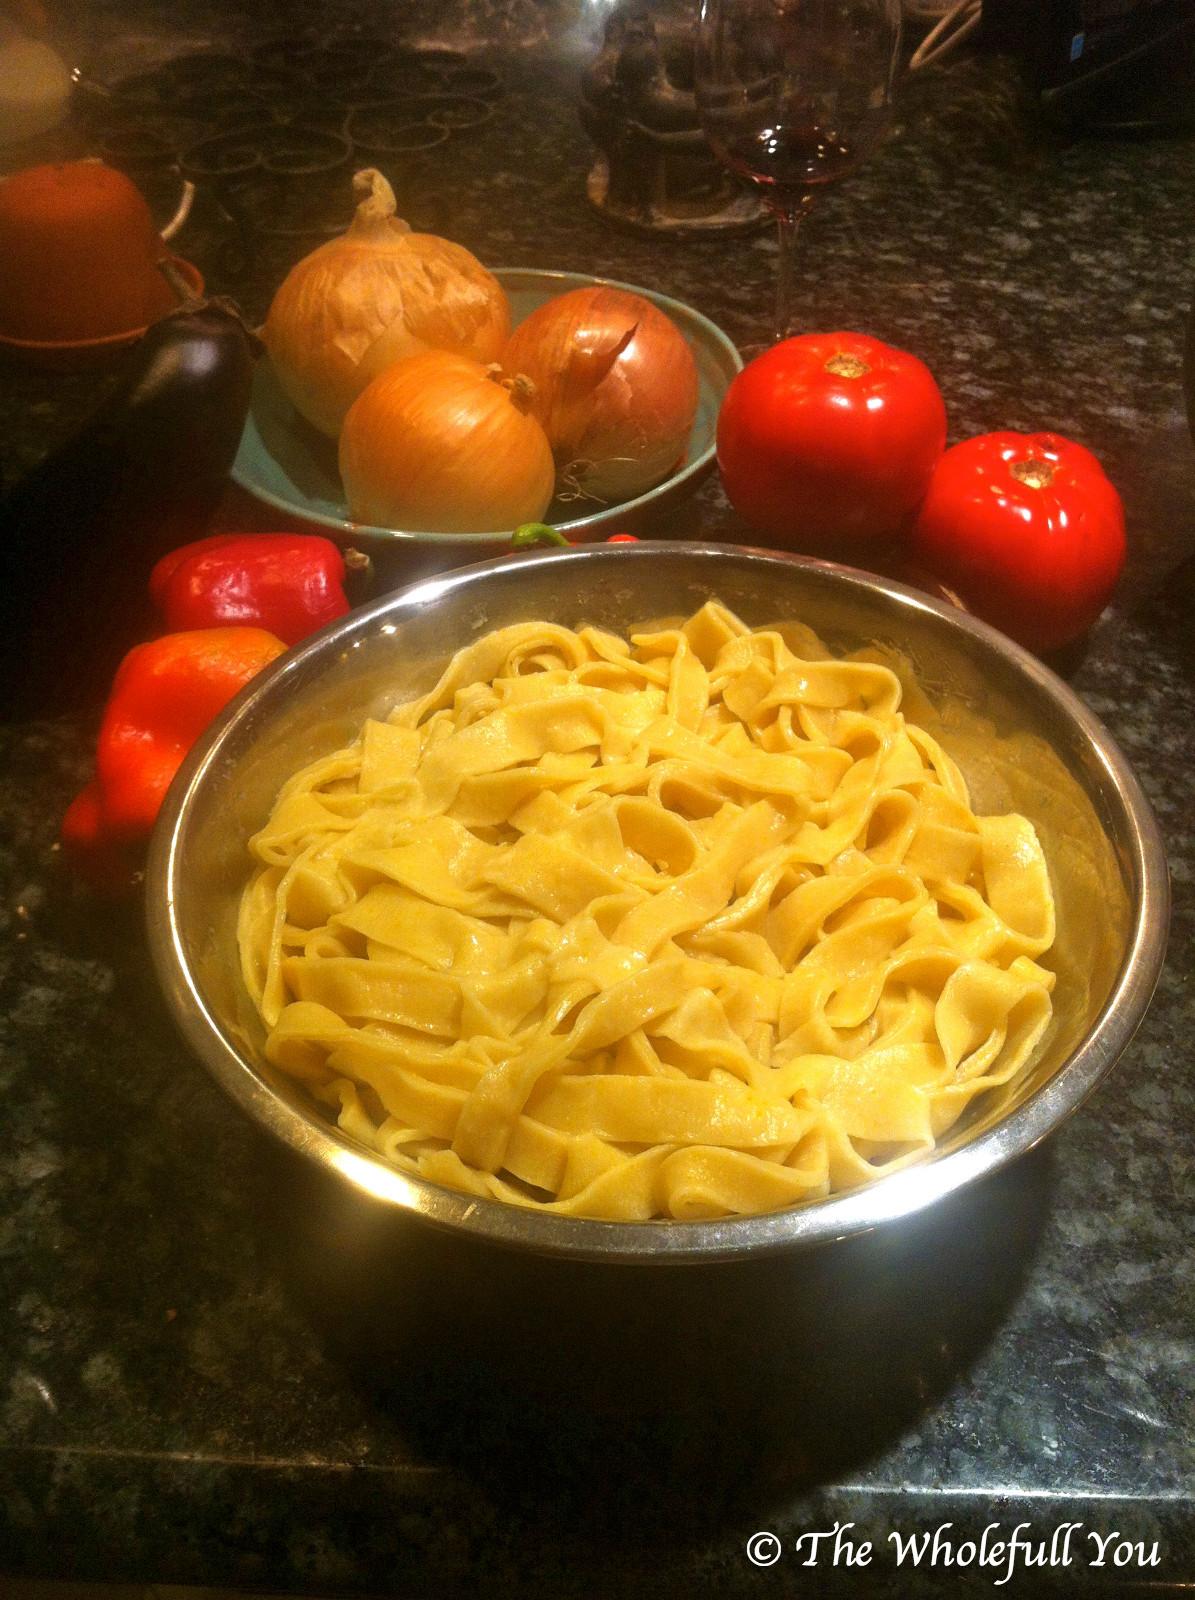 Vegan Homemade Pasta  The Wholefull You Homemade Vegan Pasta Recipe